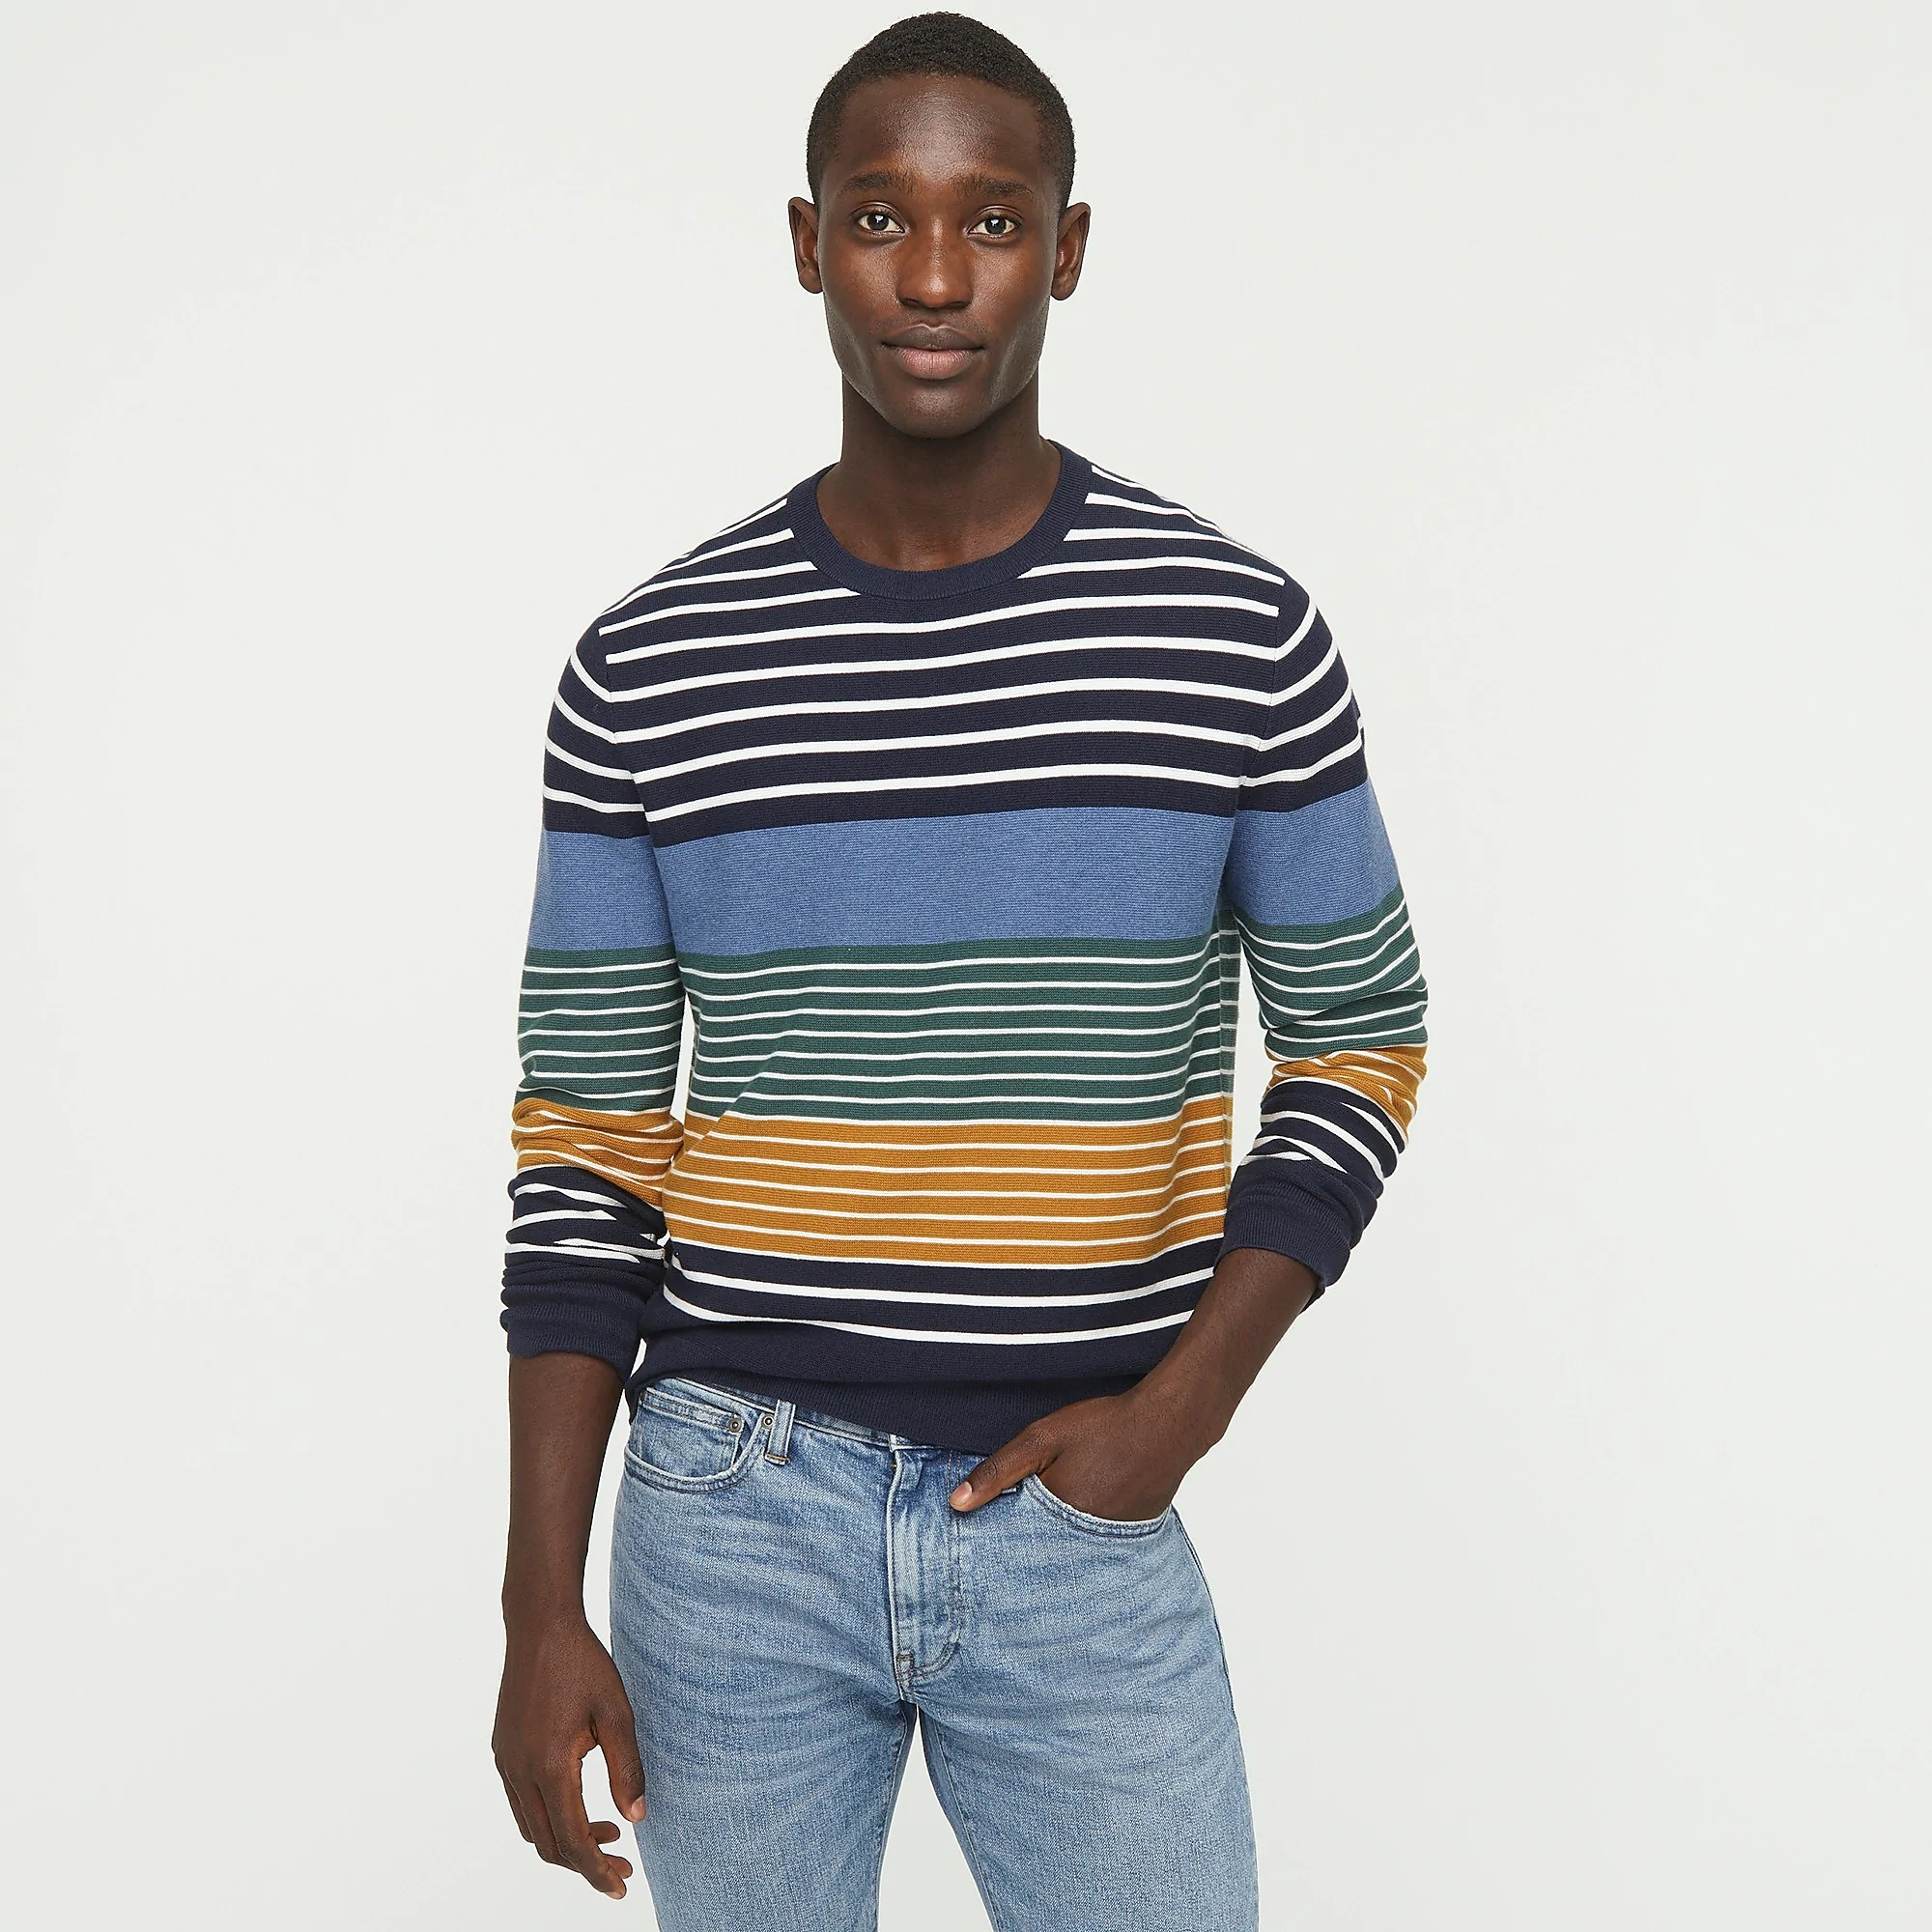 J.Crew-Crewneck-Sweater-in-Garter-Stitch stripes